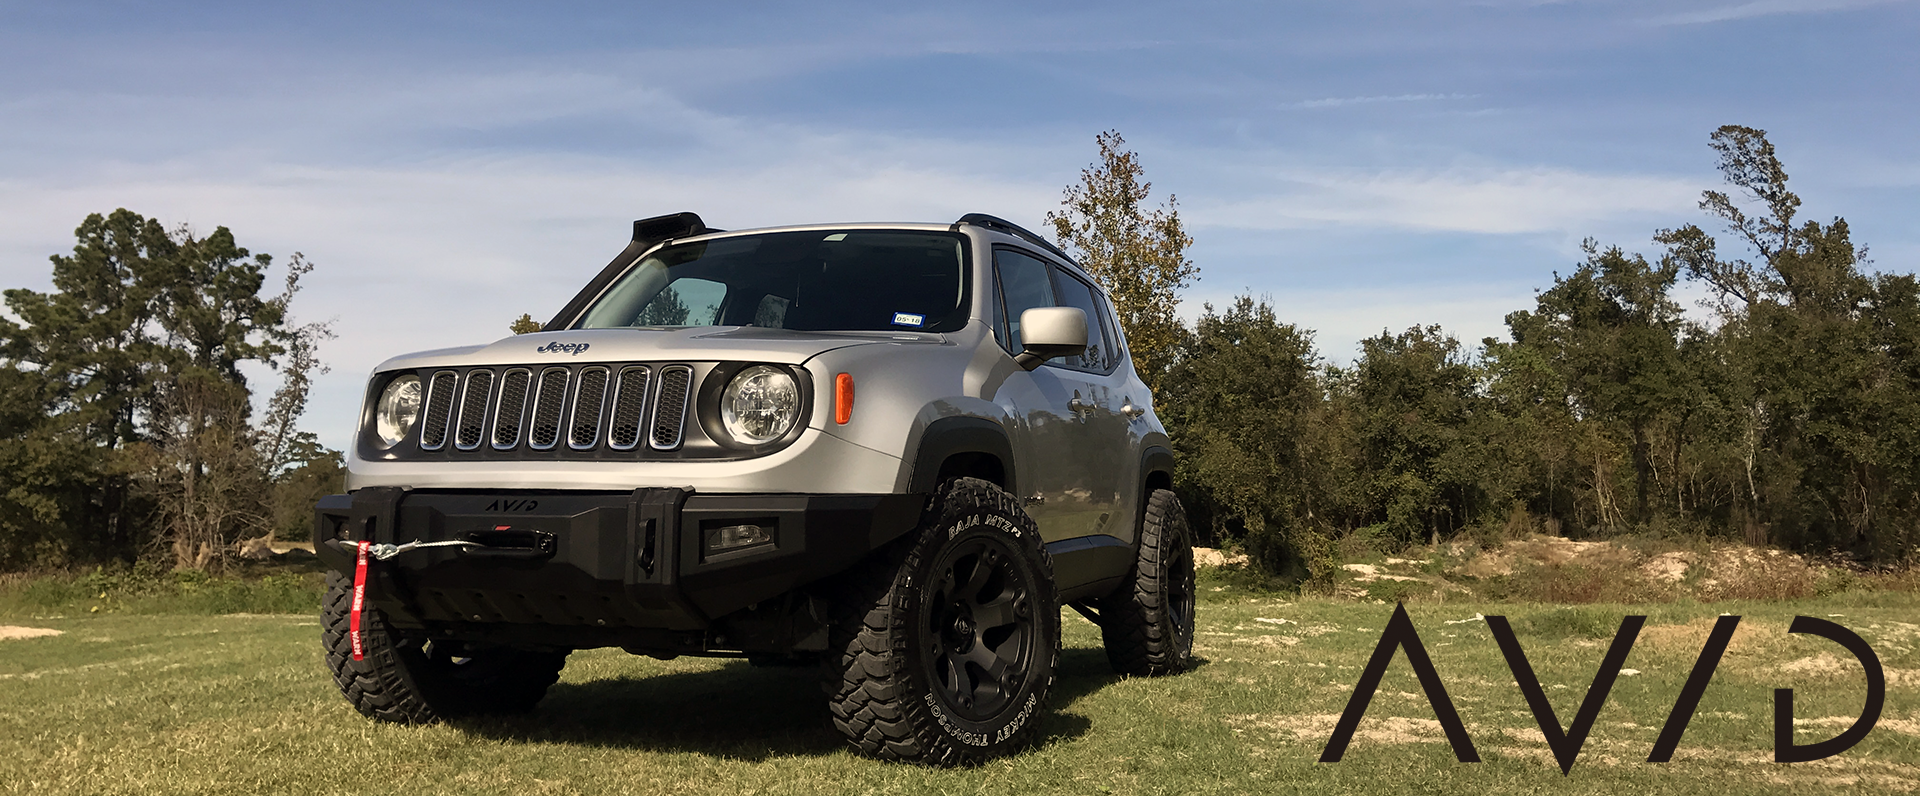 Jeep Renegade Front Bumper Jeep Renegade Renegade Jeep Renegade Trailhawk